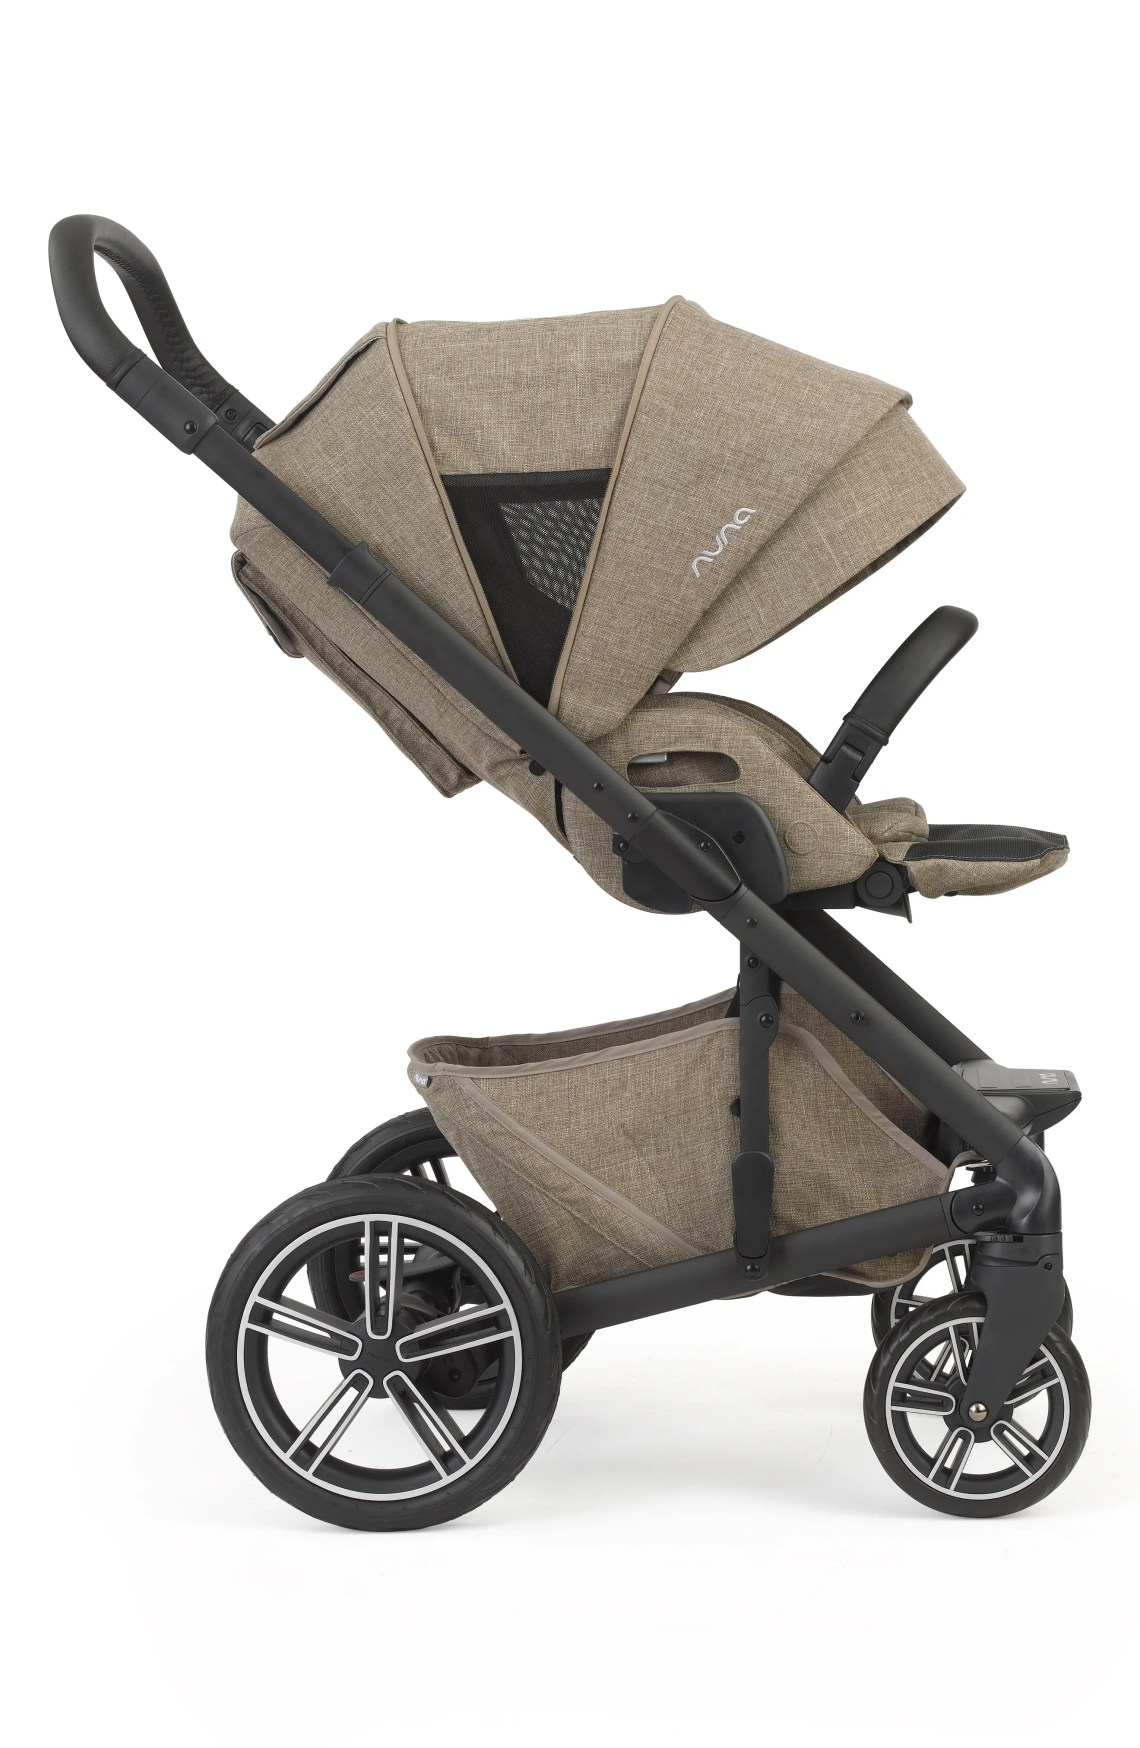 Main Image - nuna MIXX™ 2 Stroller System & PIPA™ Car Seat Set